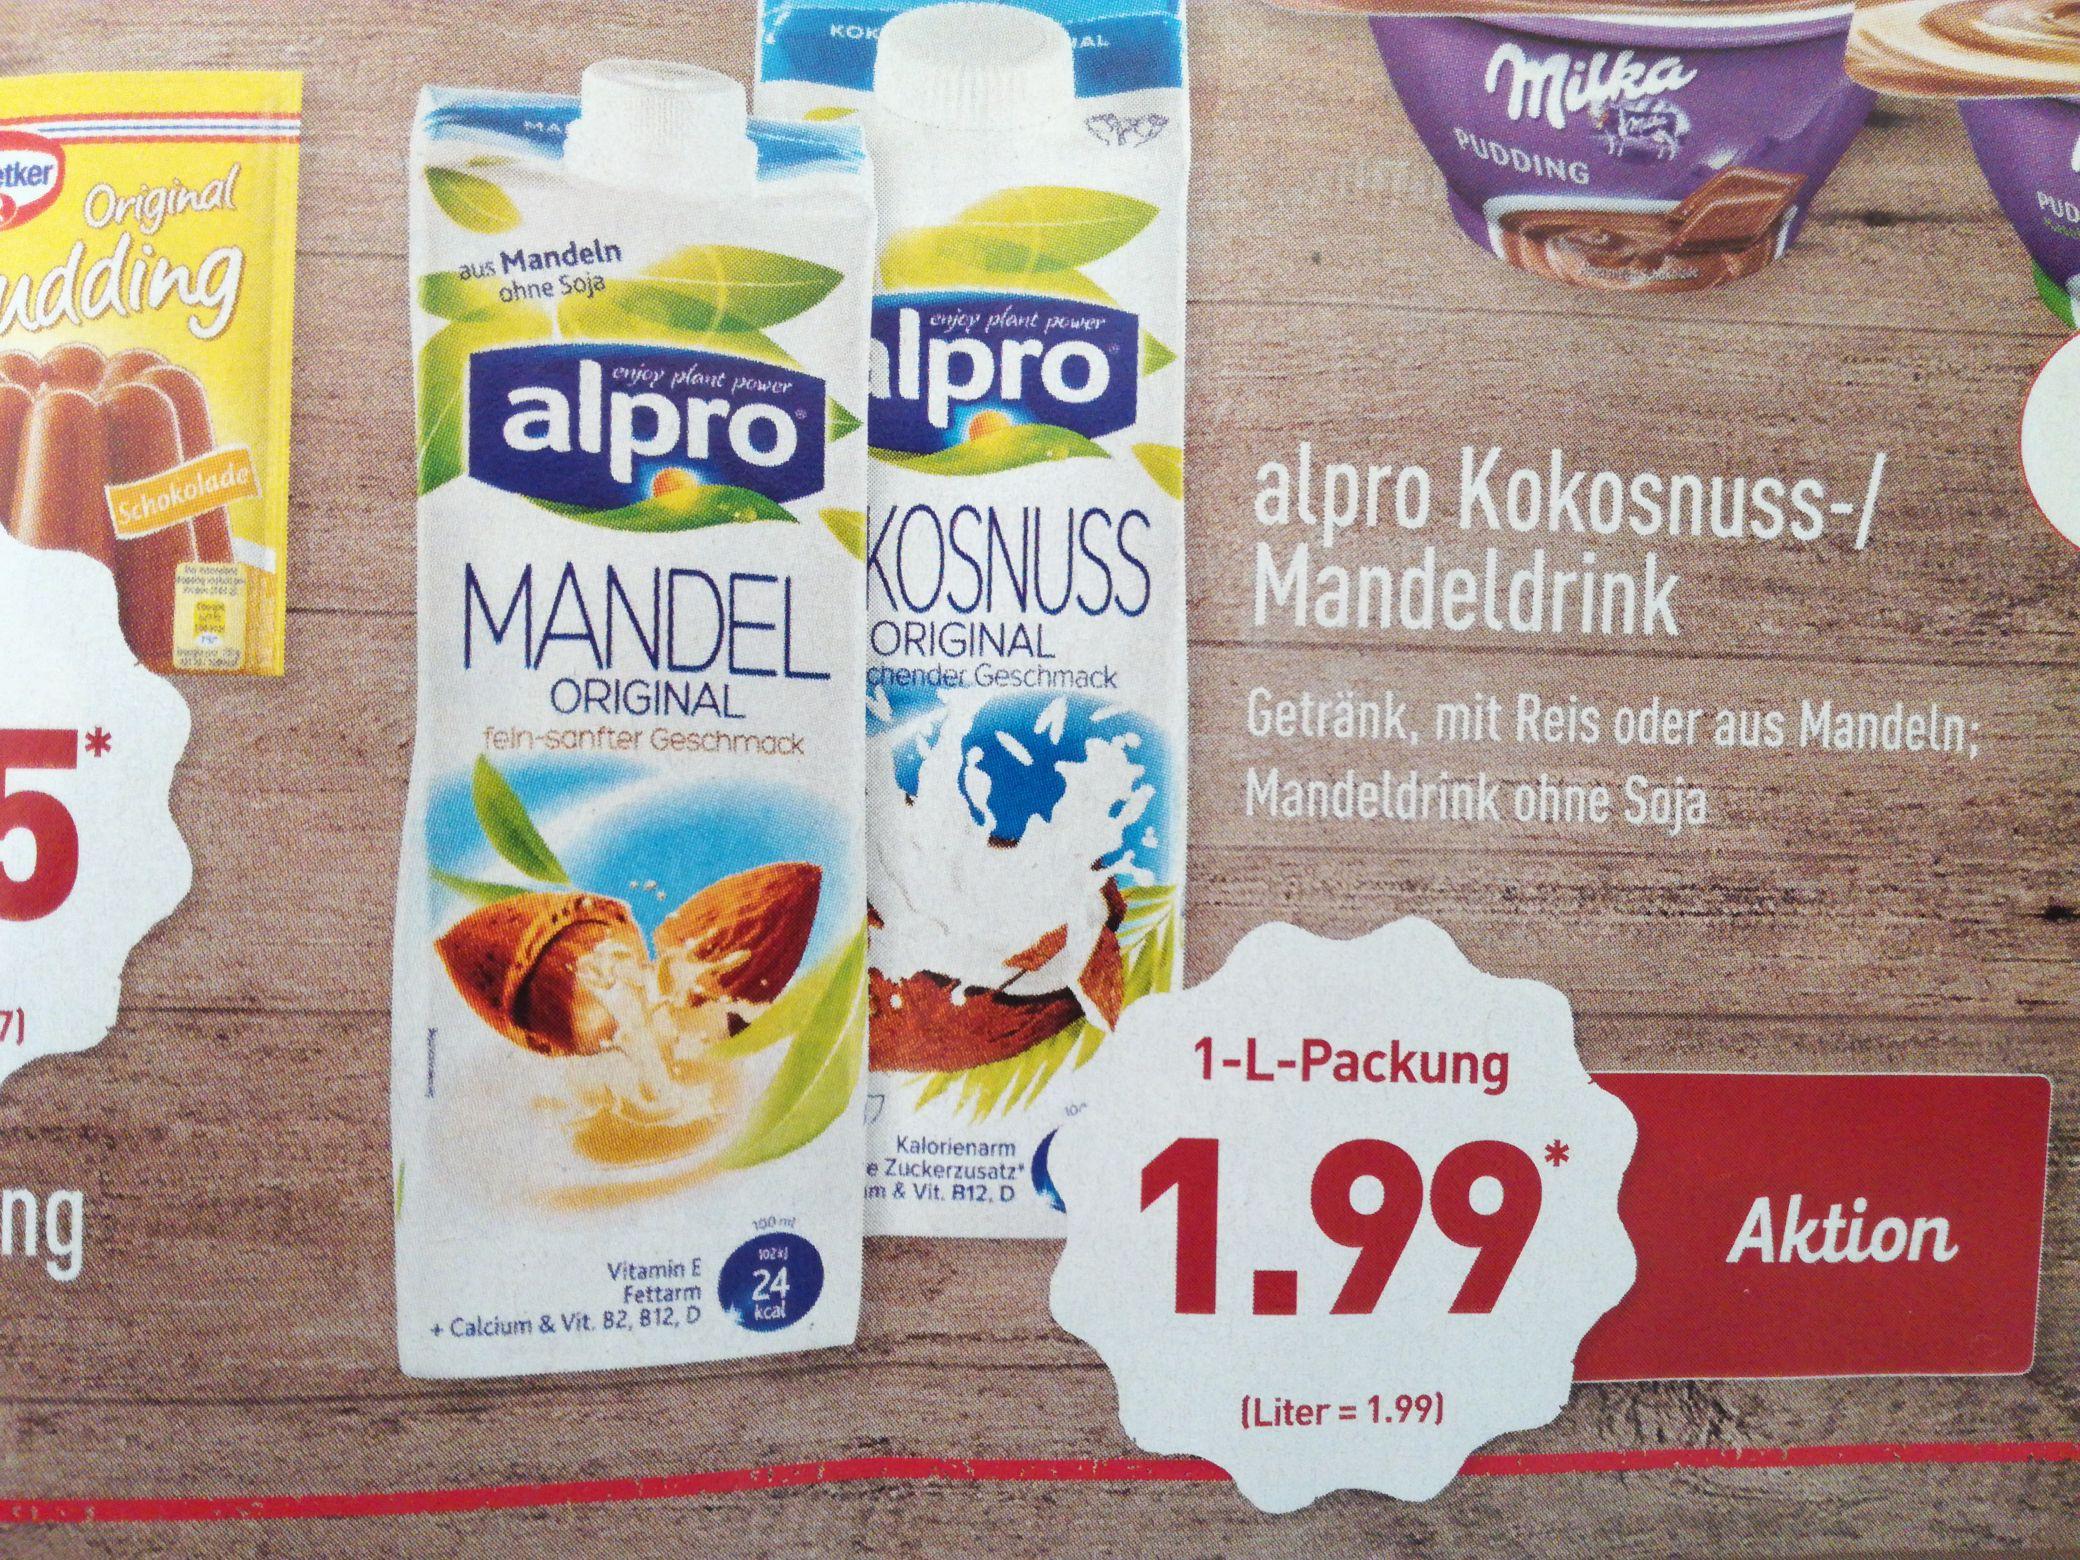 [Aldi Nord ab 06.04.] alpro Kokosnuss-/Mandeldrink